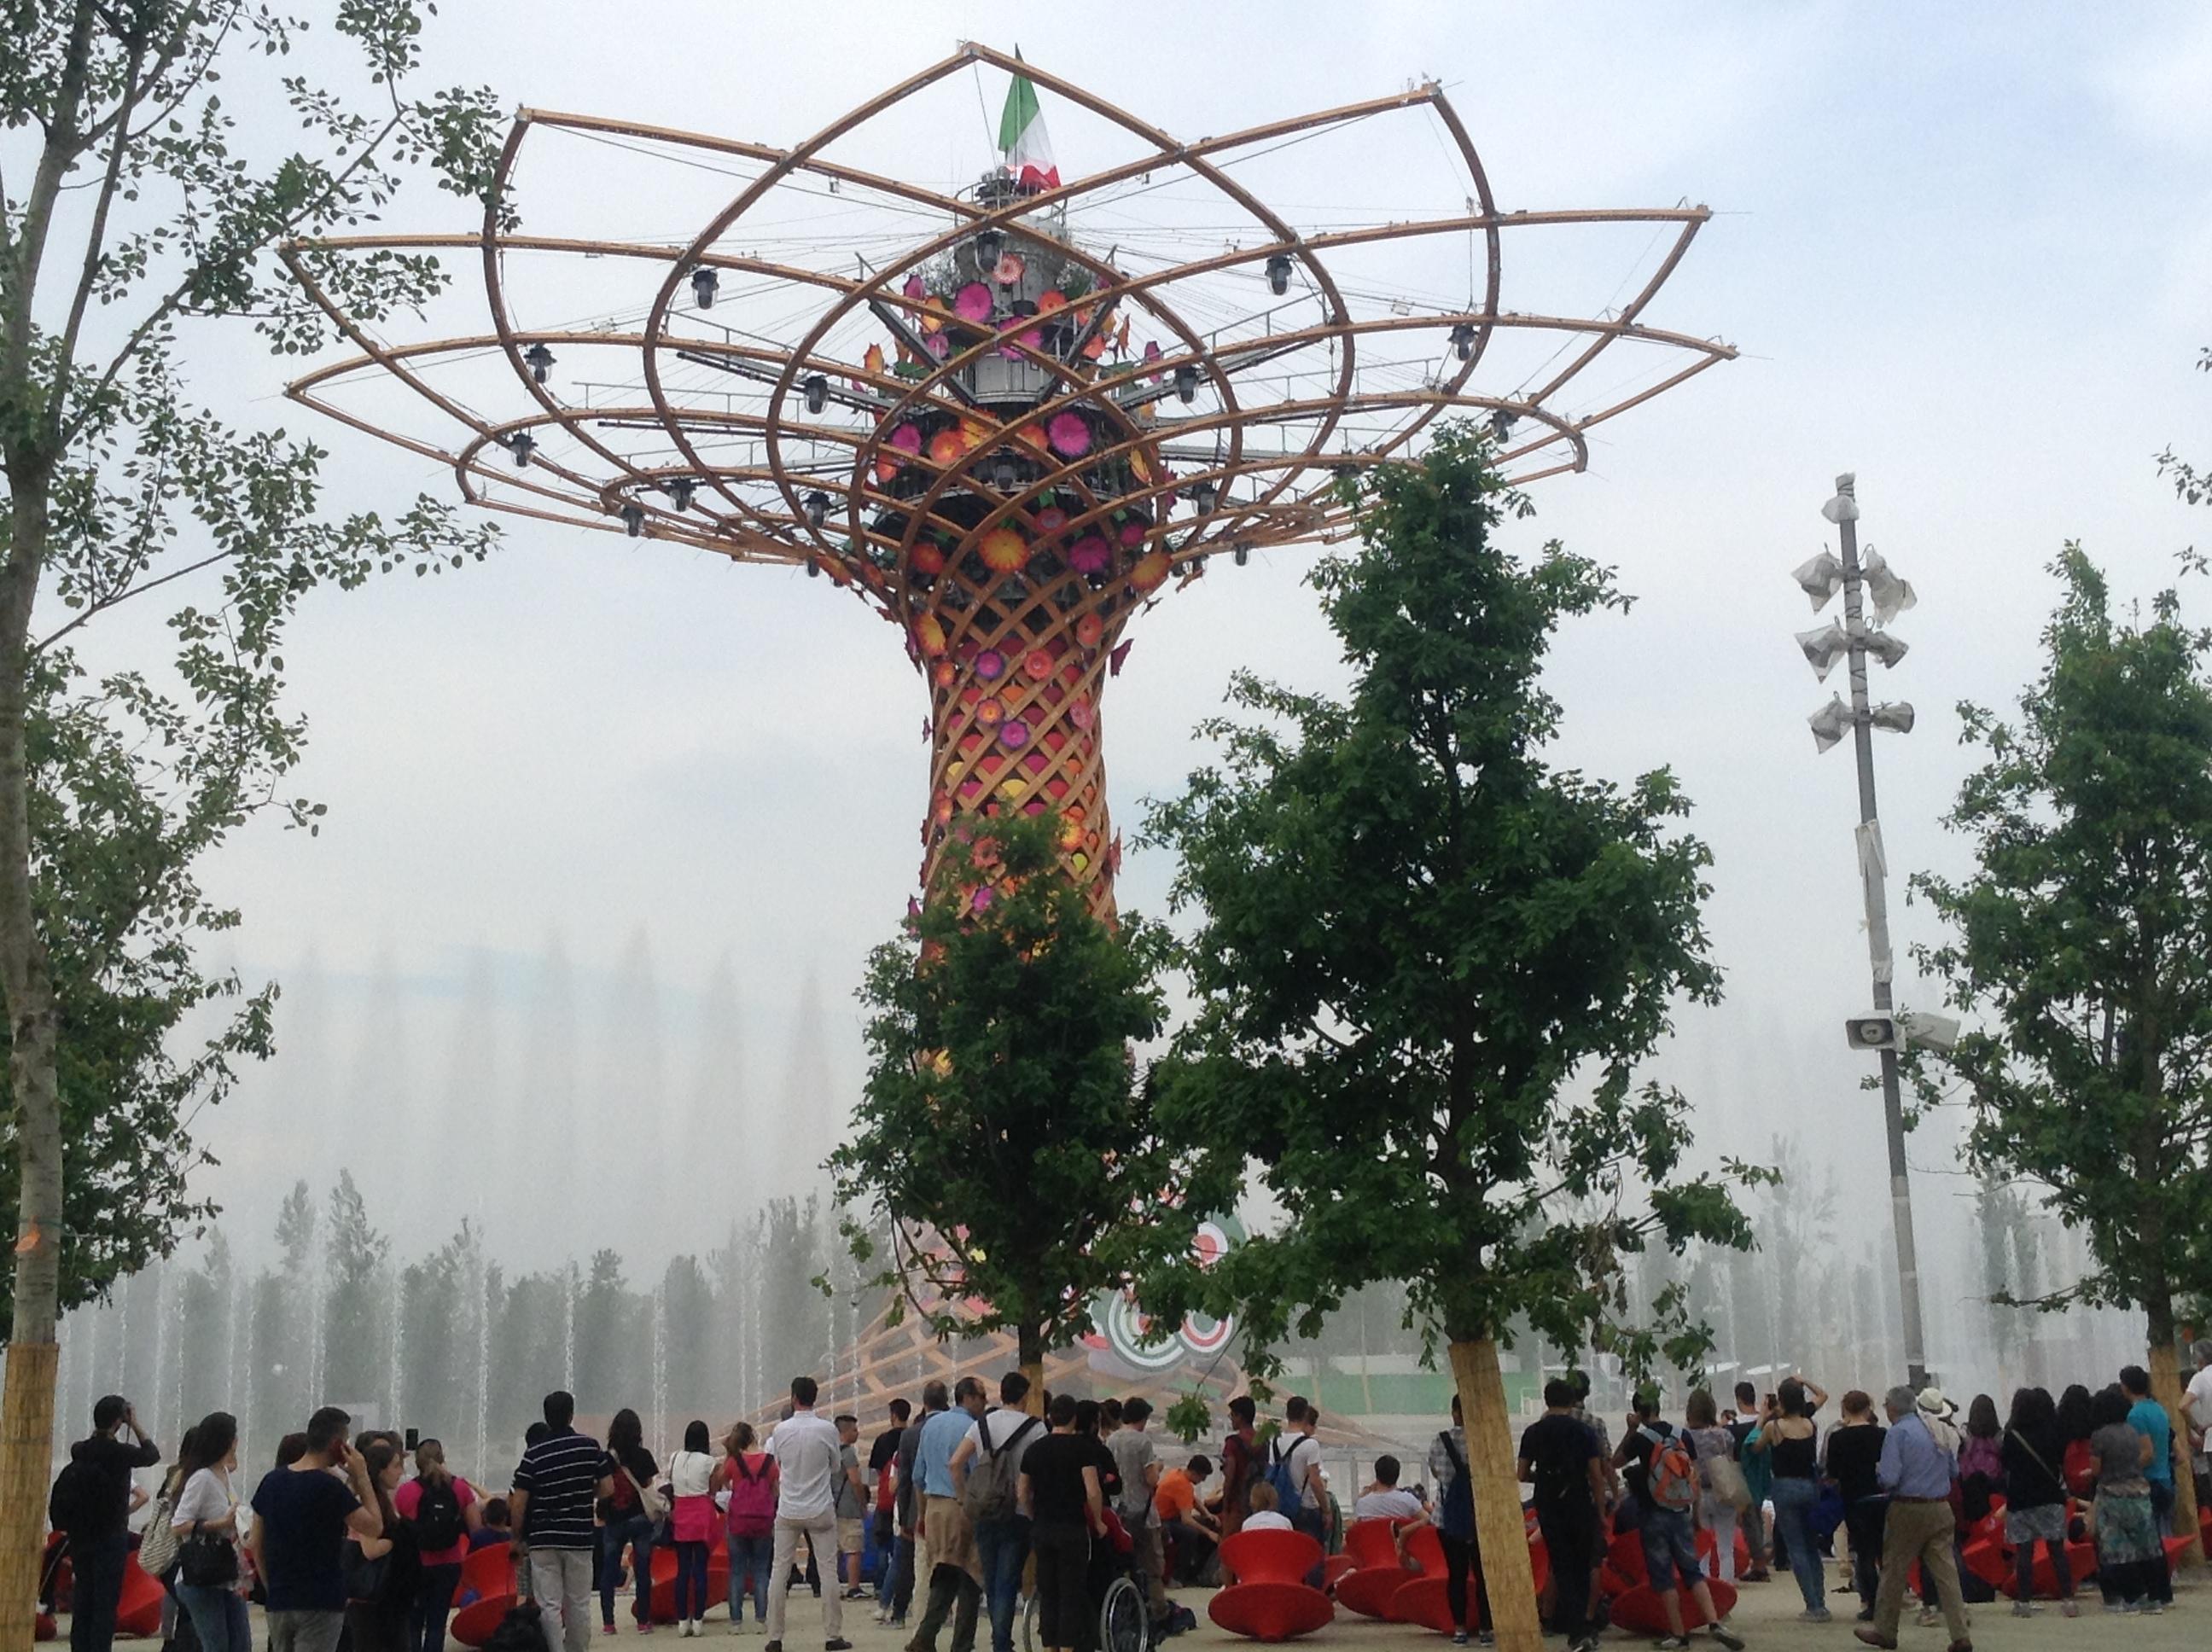 TREE OF LIFE / ALBERO DELLA VITA, Milano Expo 2015, MilanKaRaja